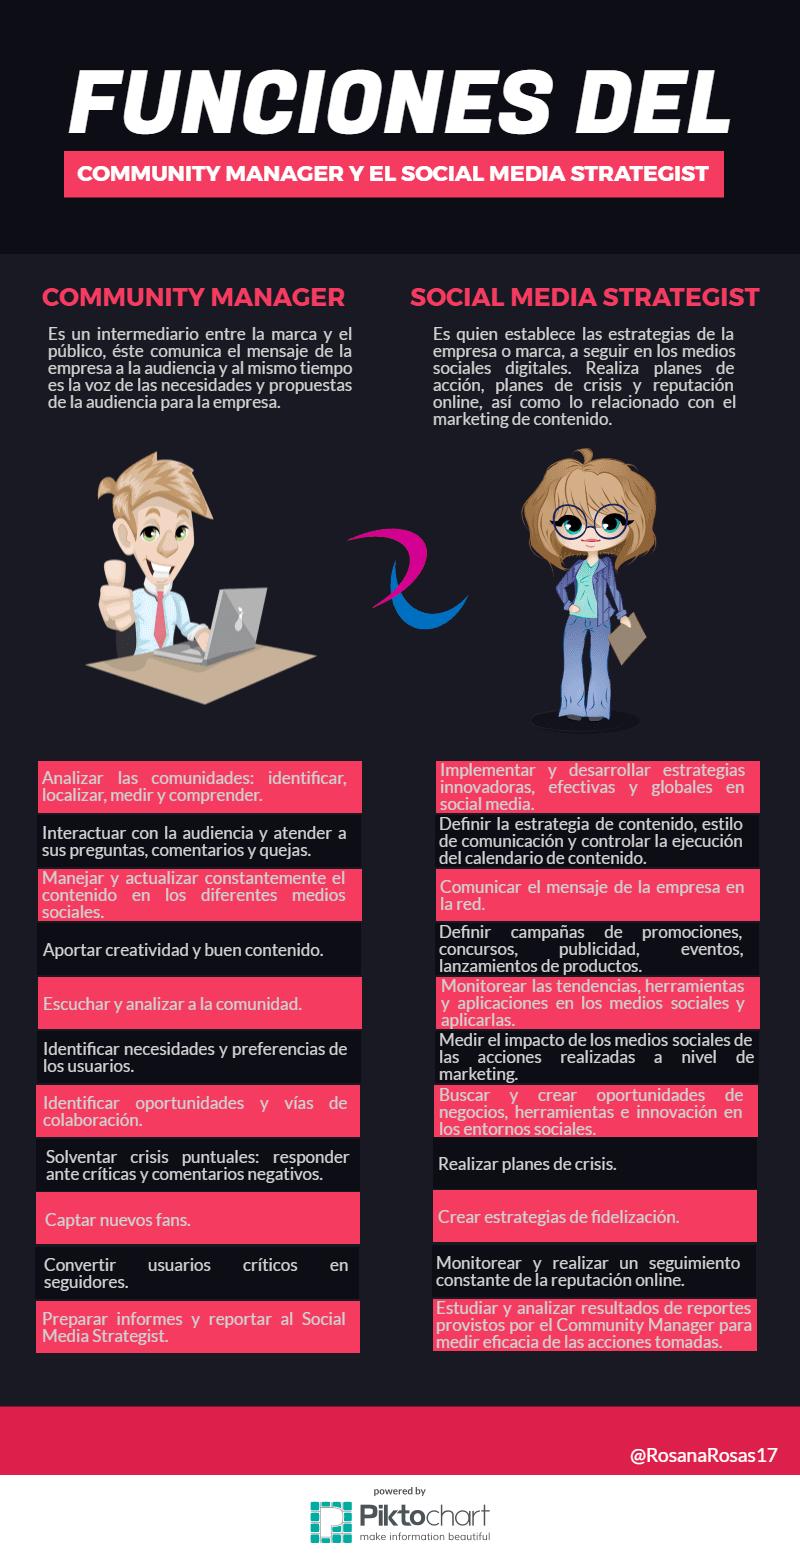 Community Manager vs Social Media Strategist